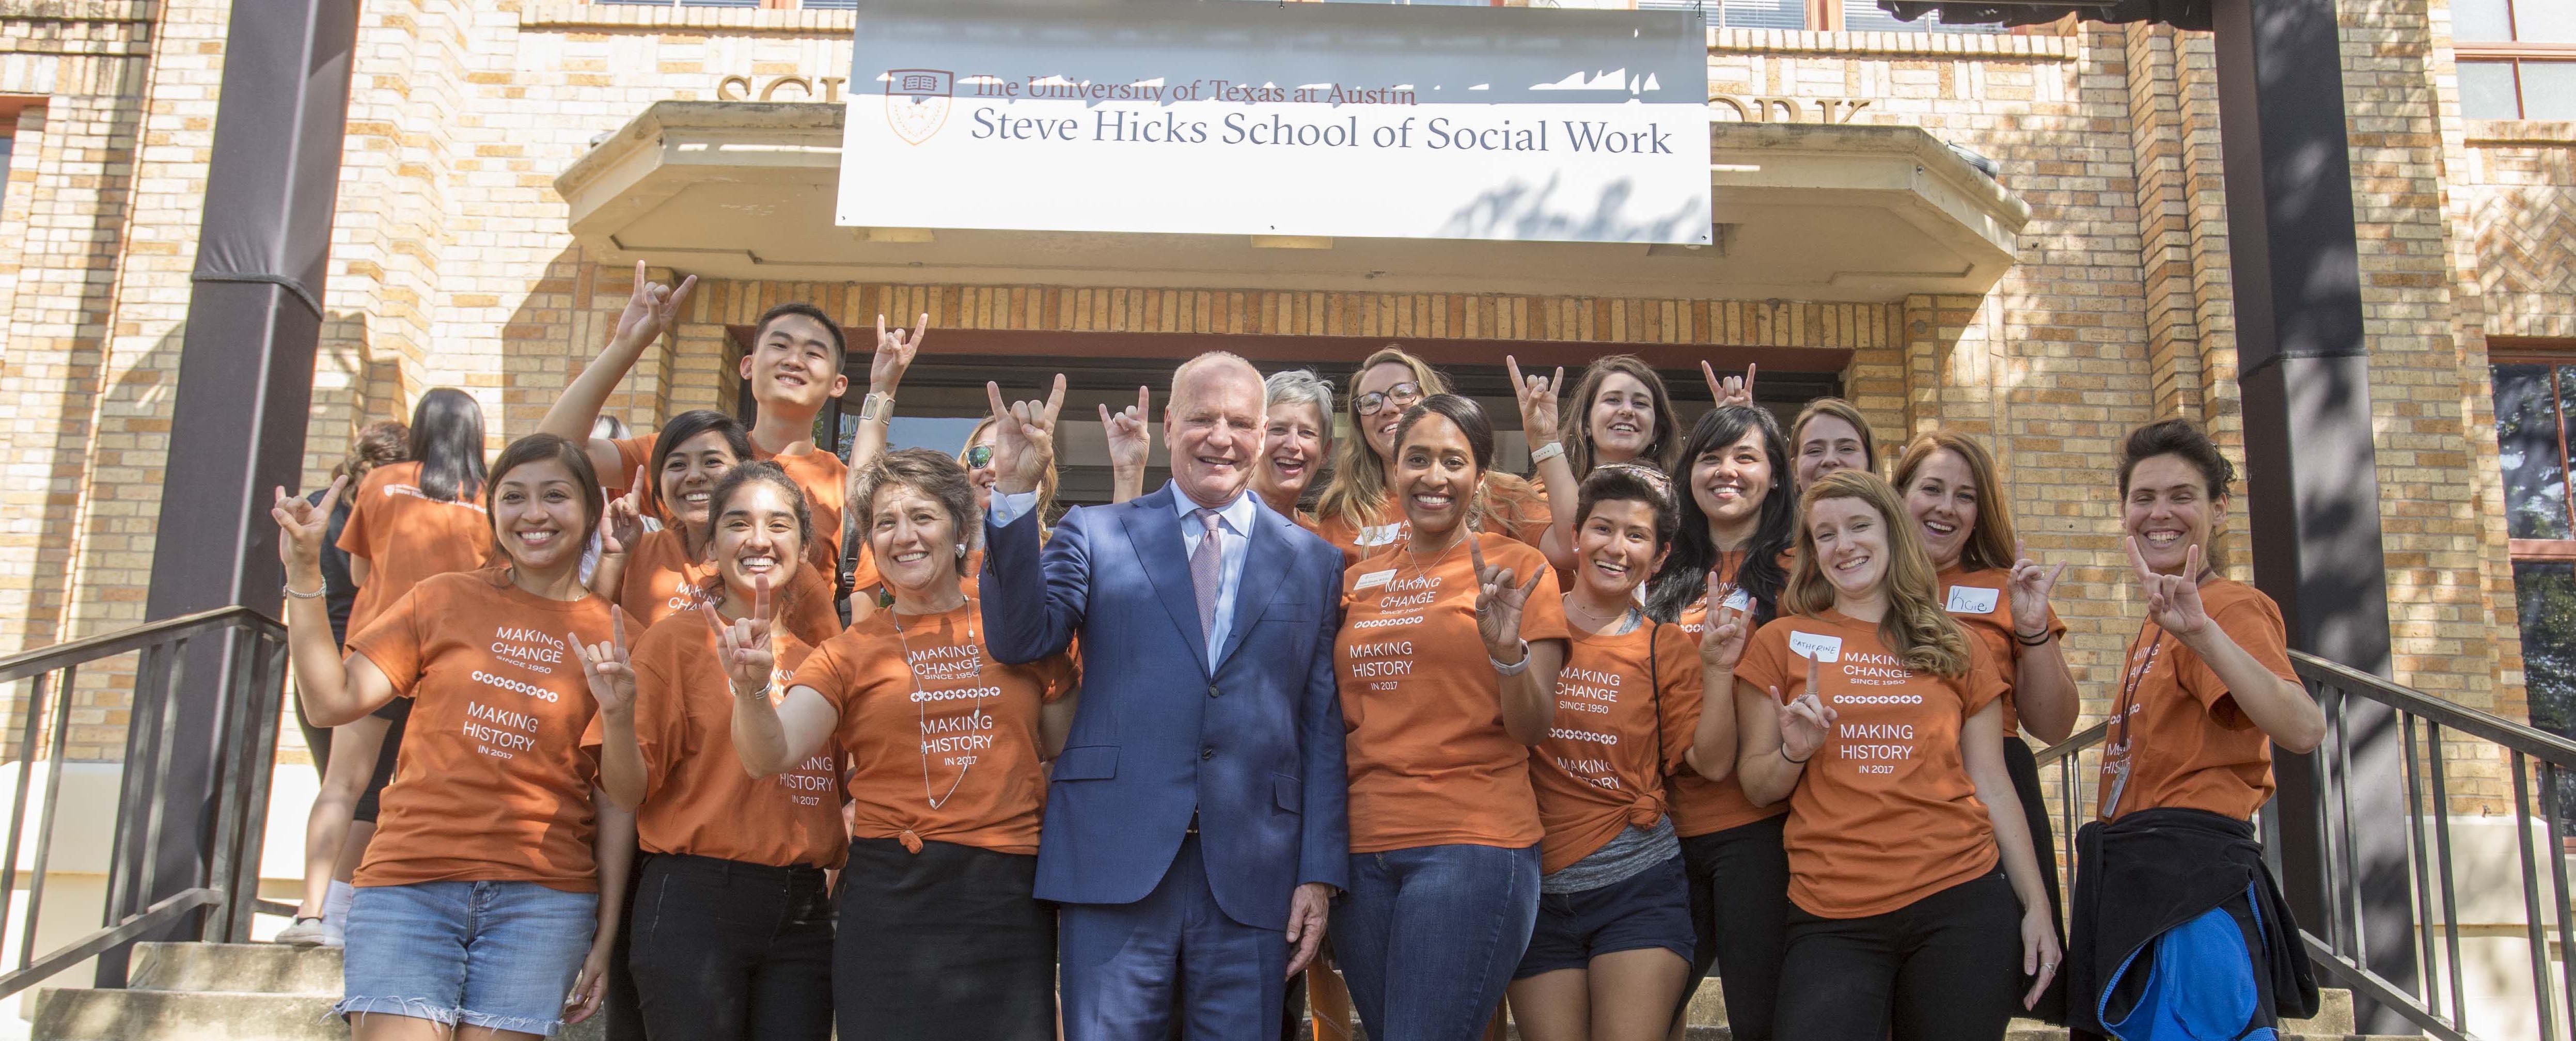 Steve Hicks School of Social Work announcement 2017